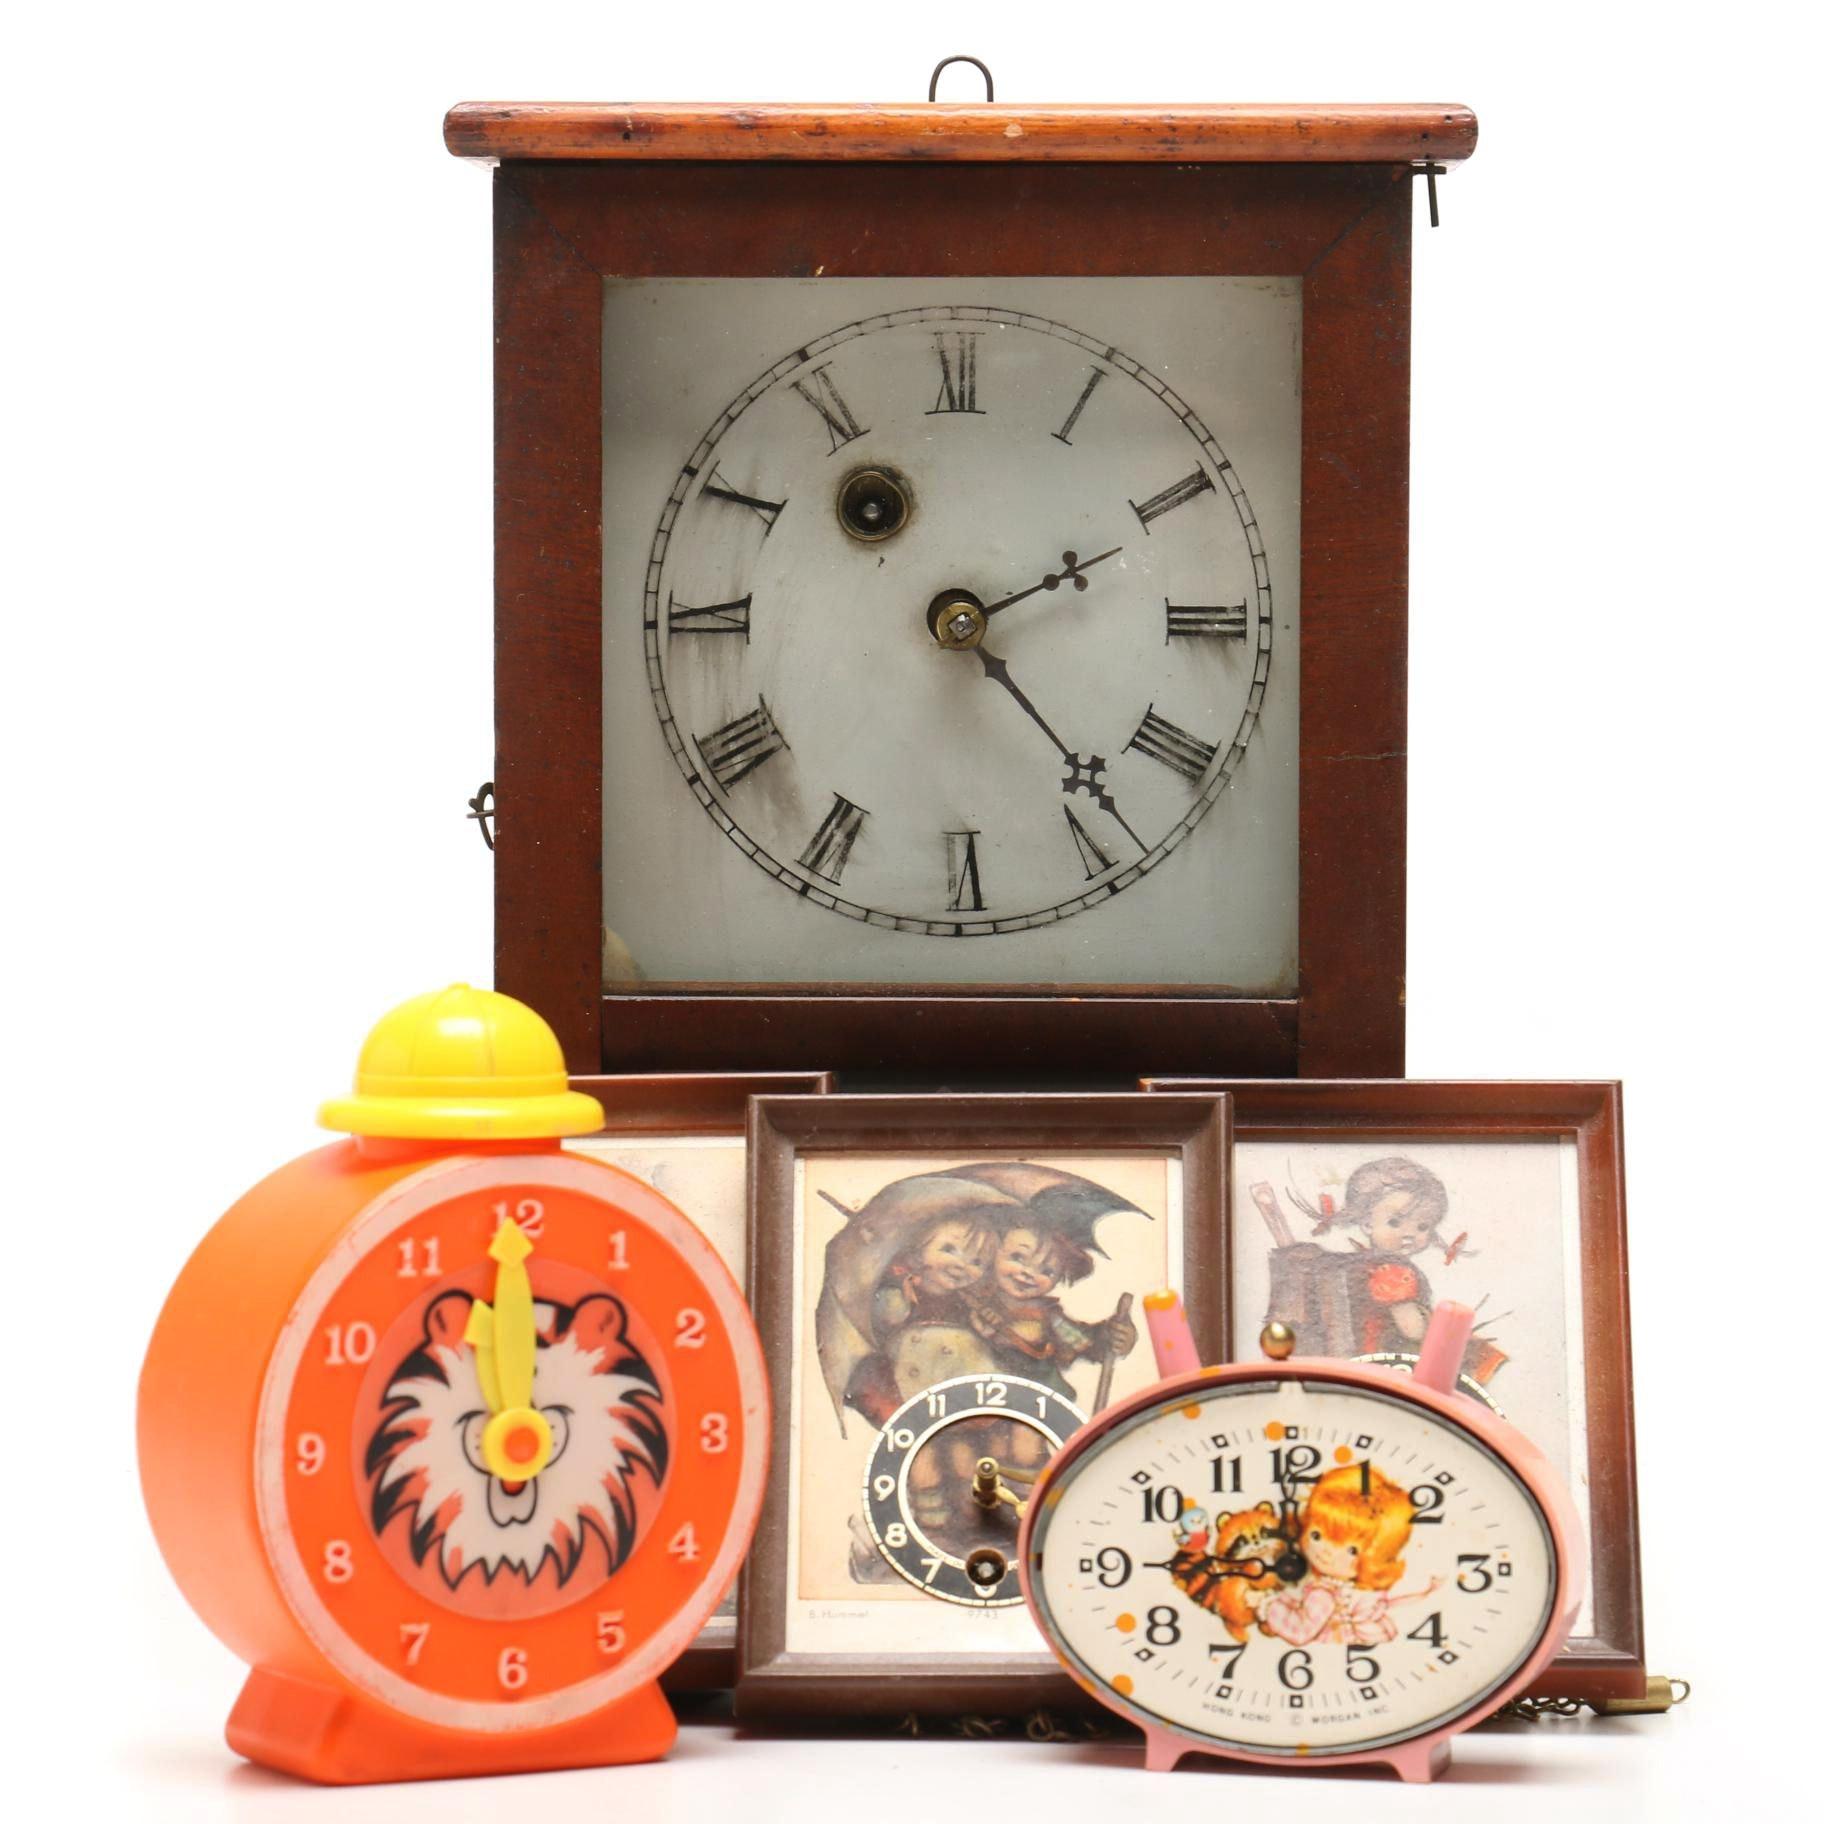 Antique Waterbury Cottage Clock and Hummel Clocks